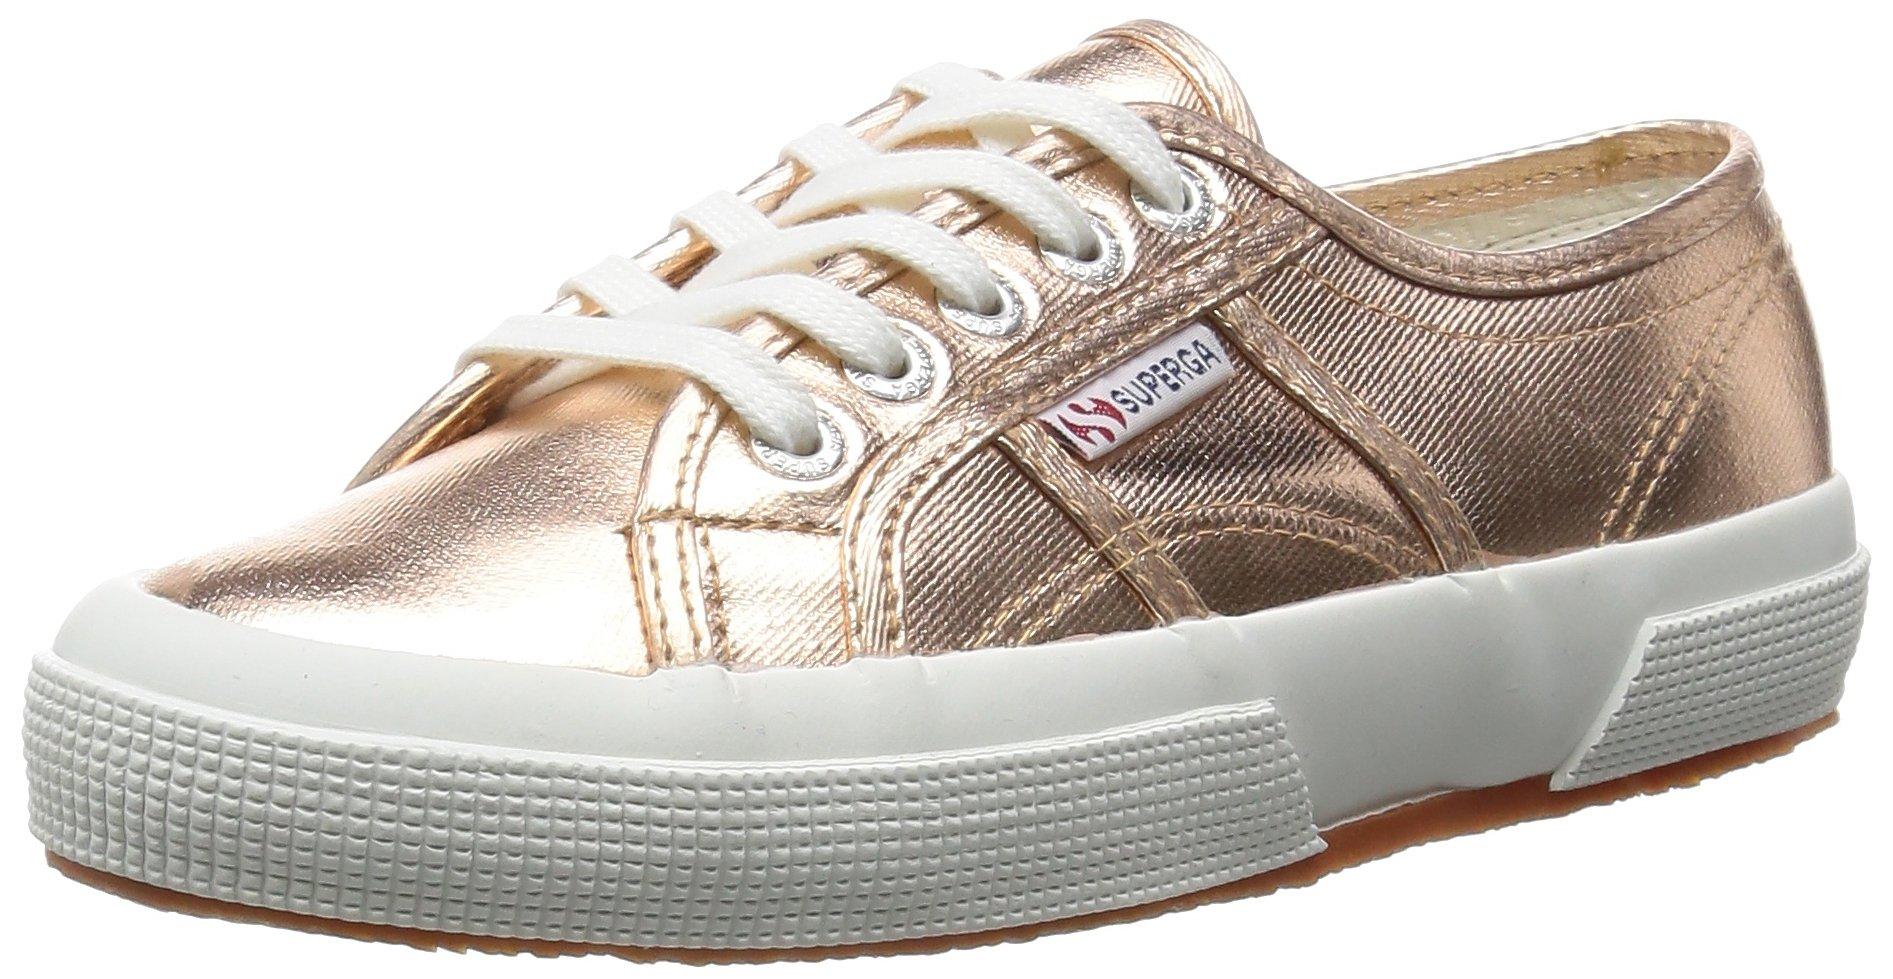 SneakerMixte Eu 2750 Enfant OrGold91635 Cotmetu Superga UzGLqSVMpj